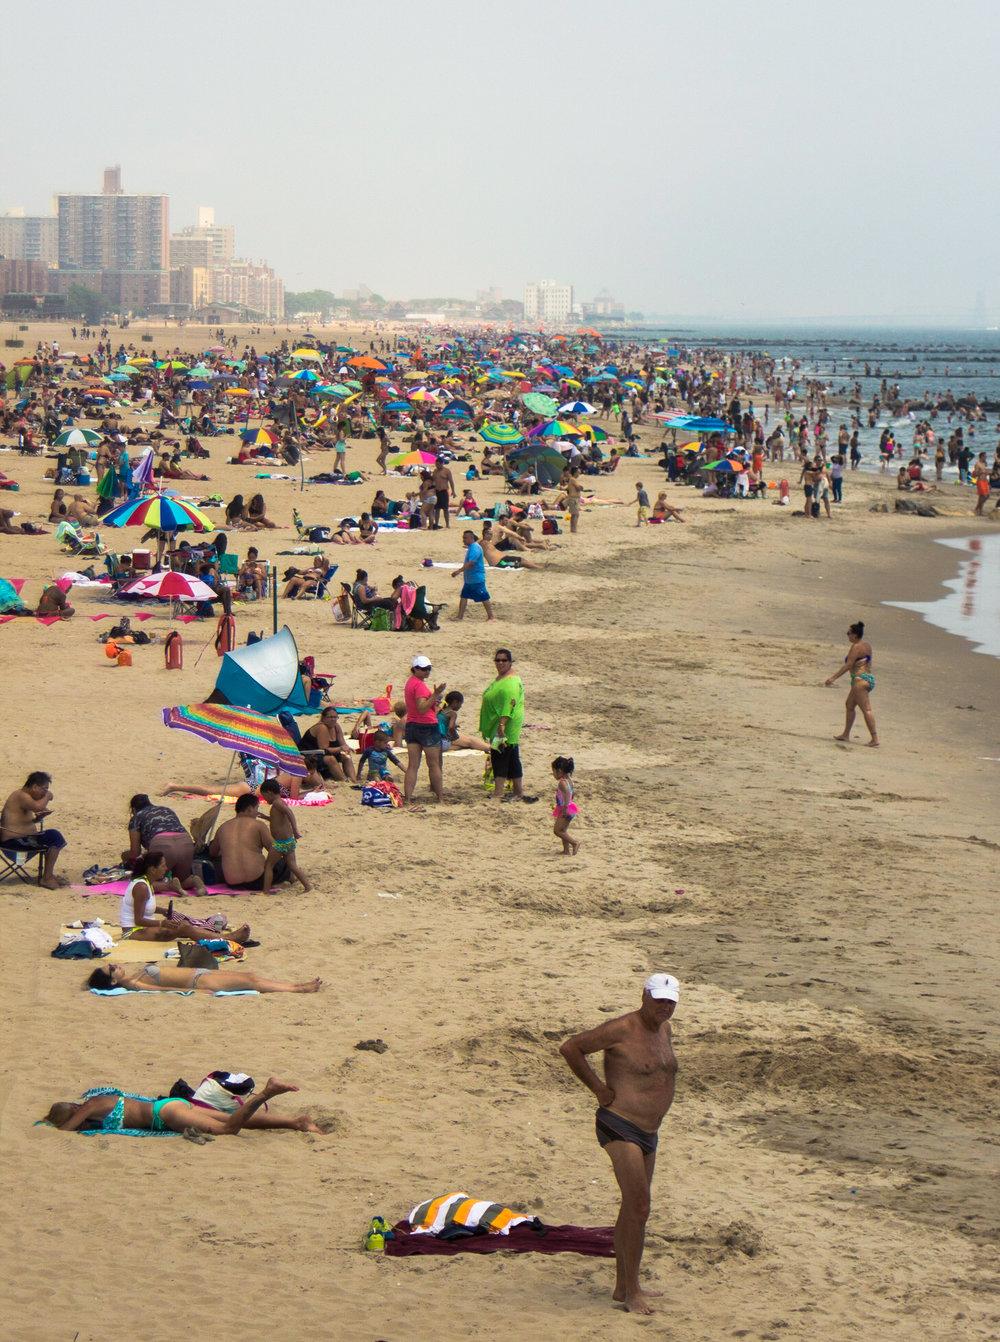 Summer at Coney Island